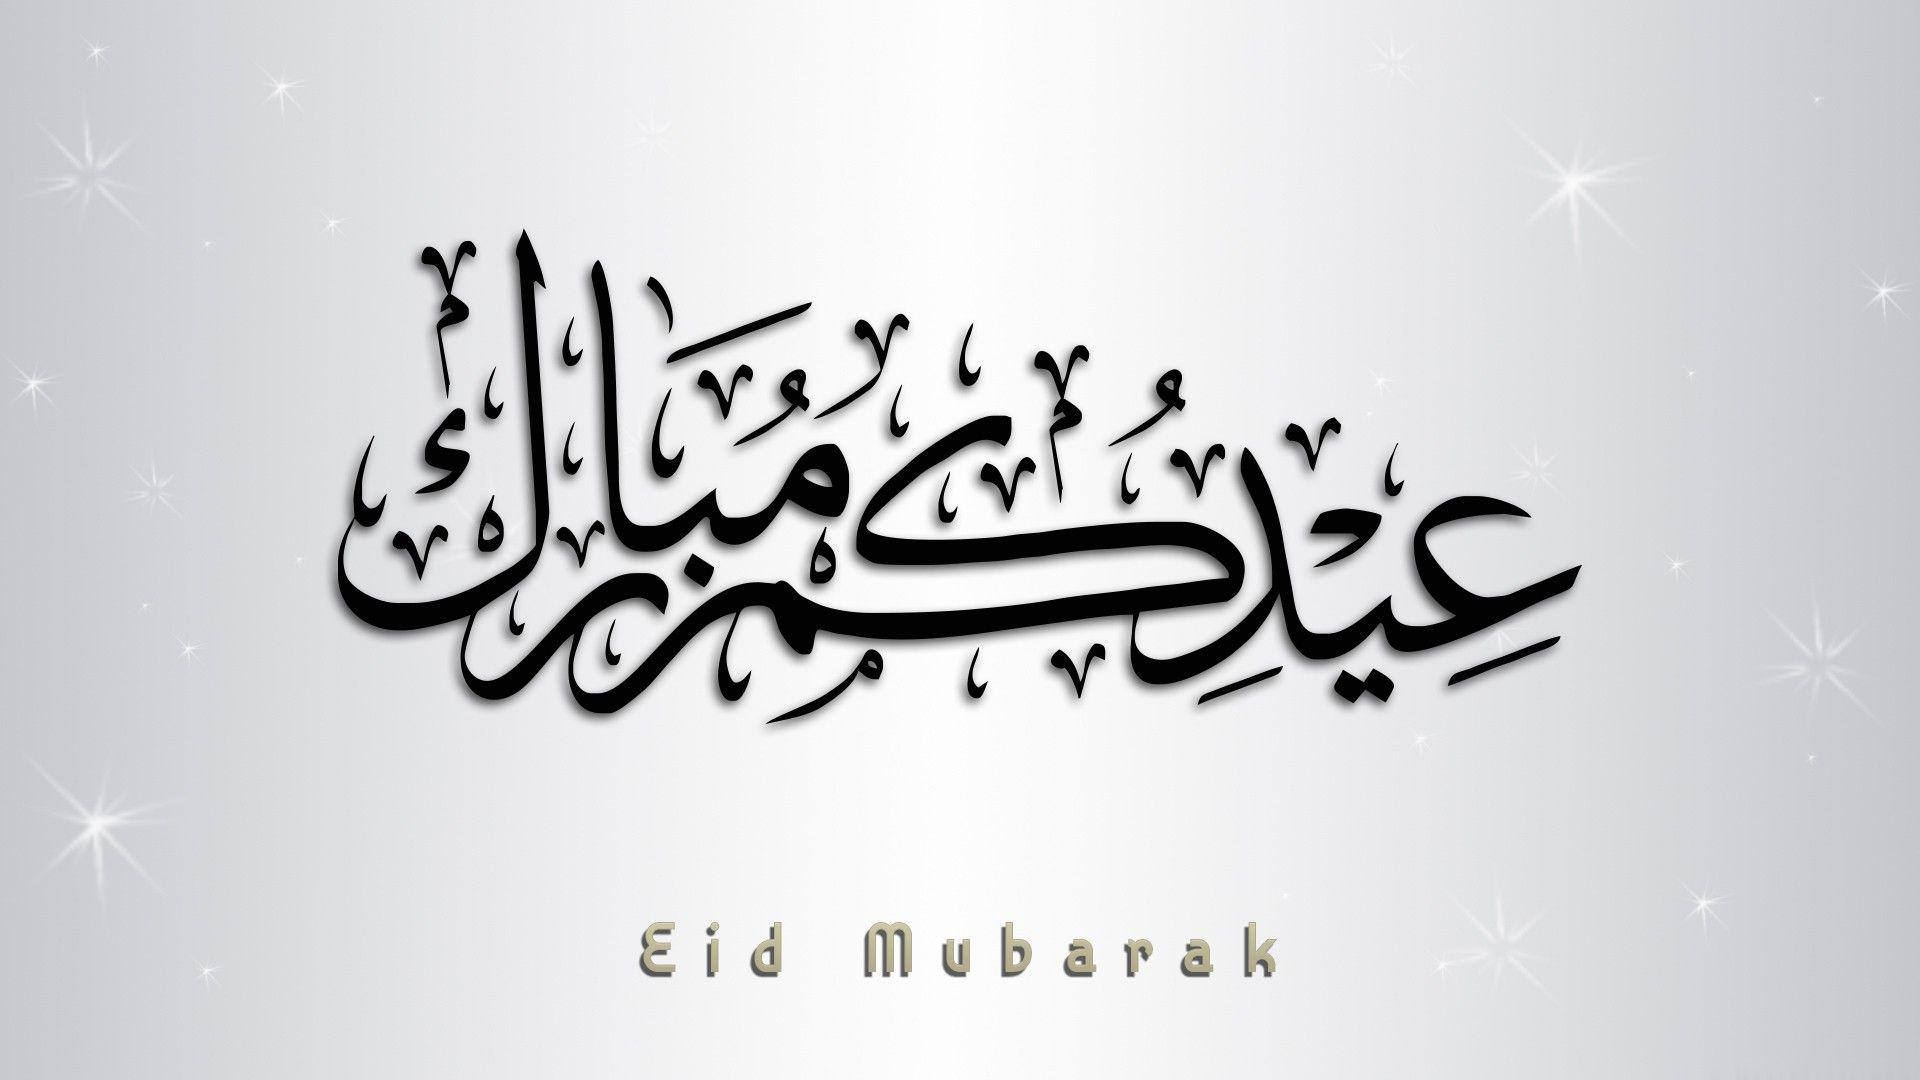 Eid Mubarak wallpaper 2021